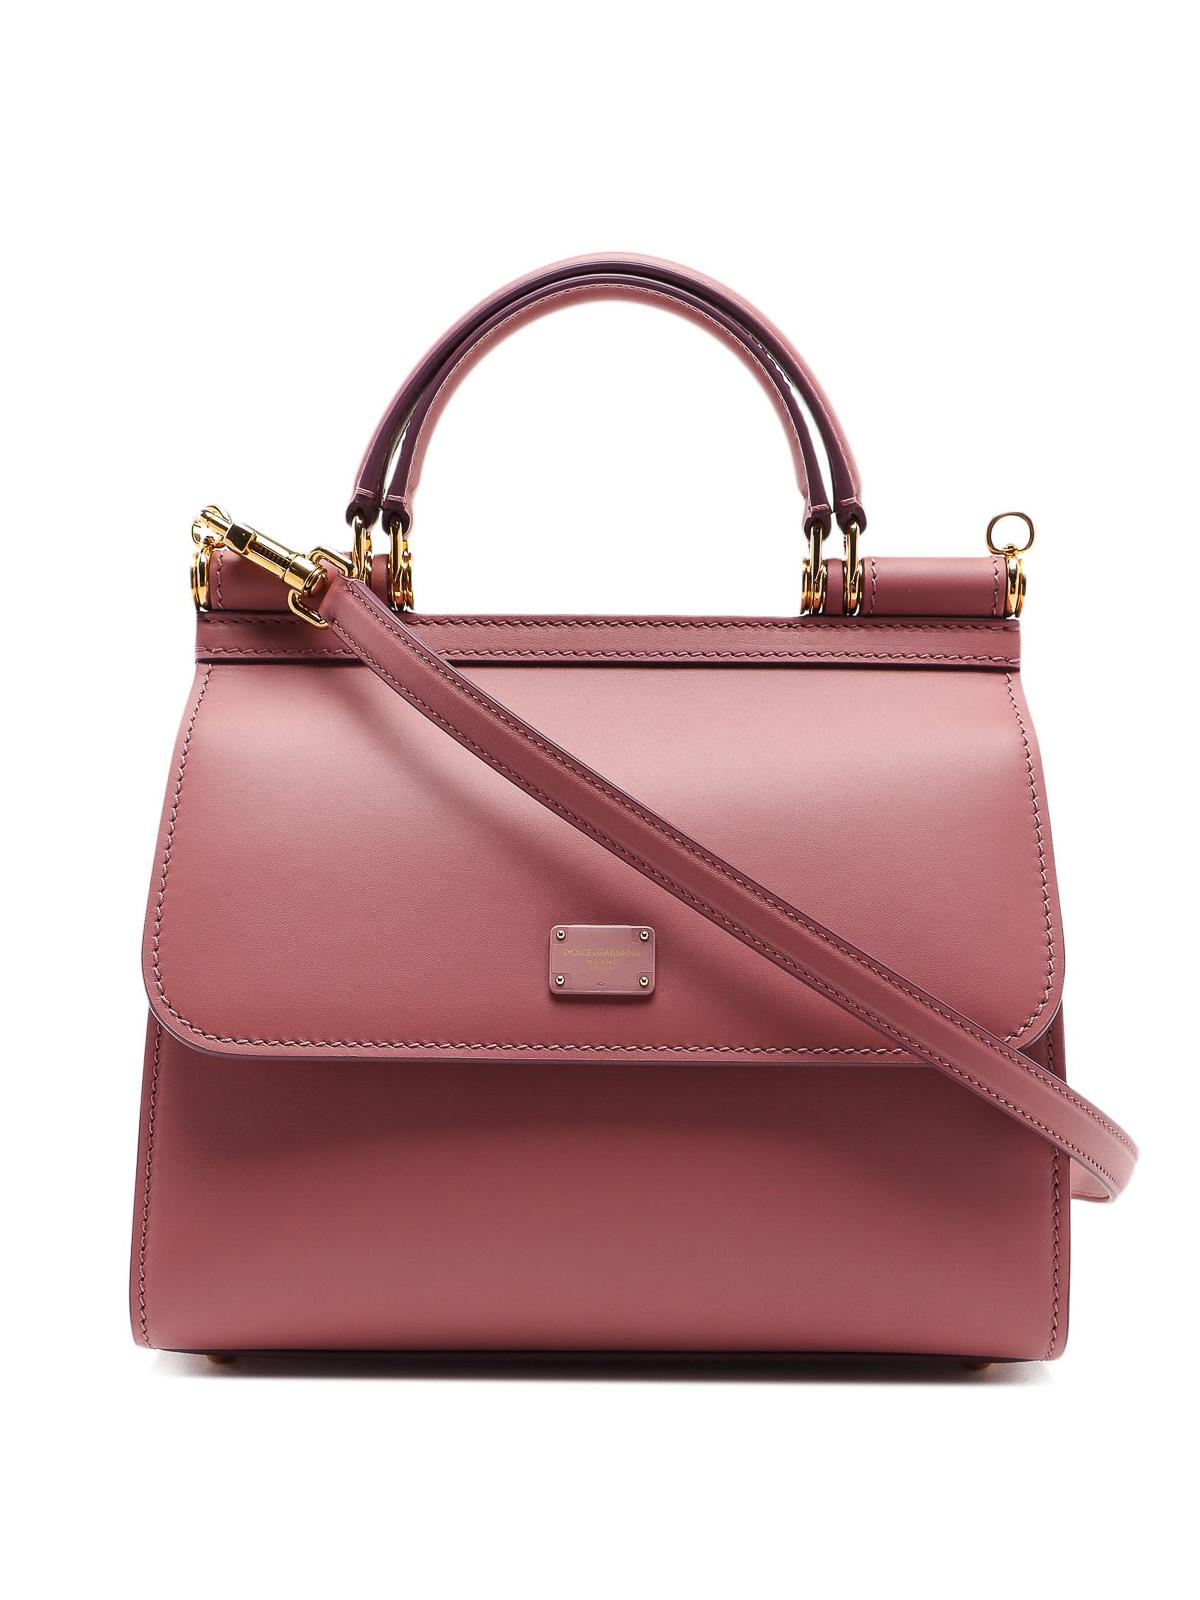 Dolce & Gabbana Sicily 58 Pink Small Bag